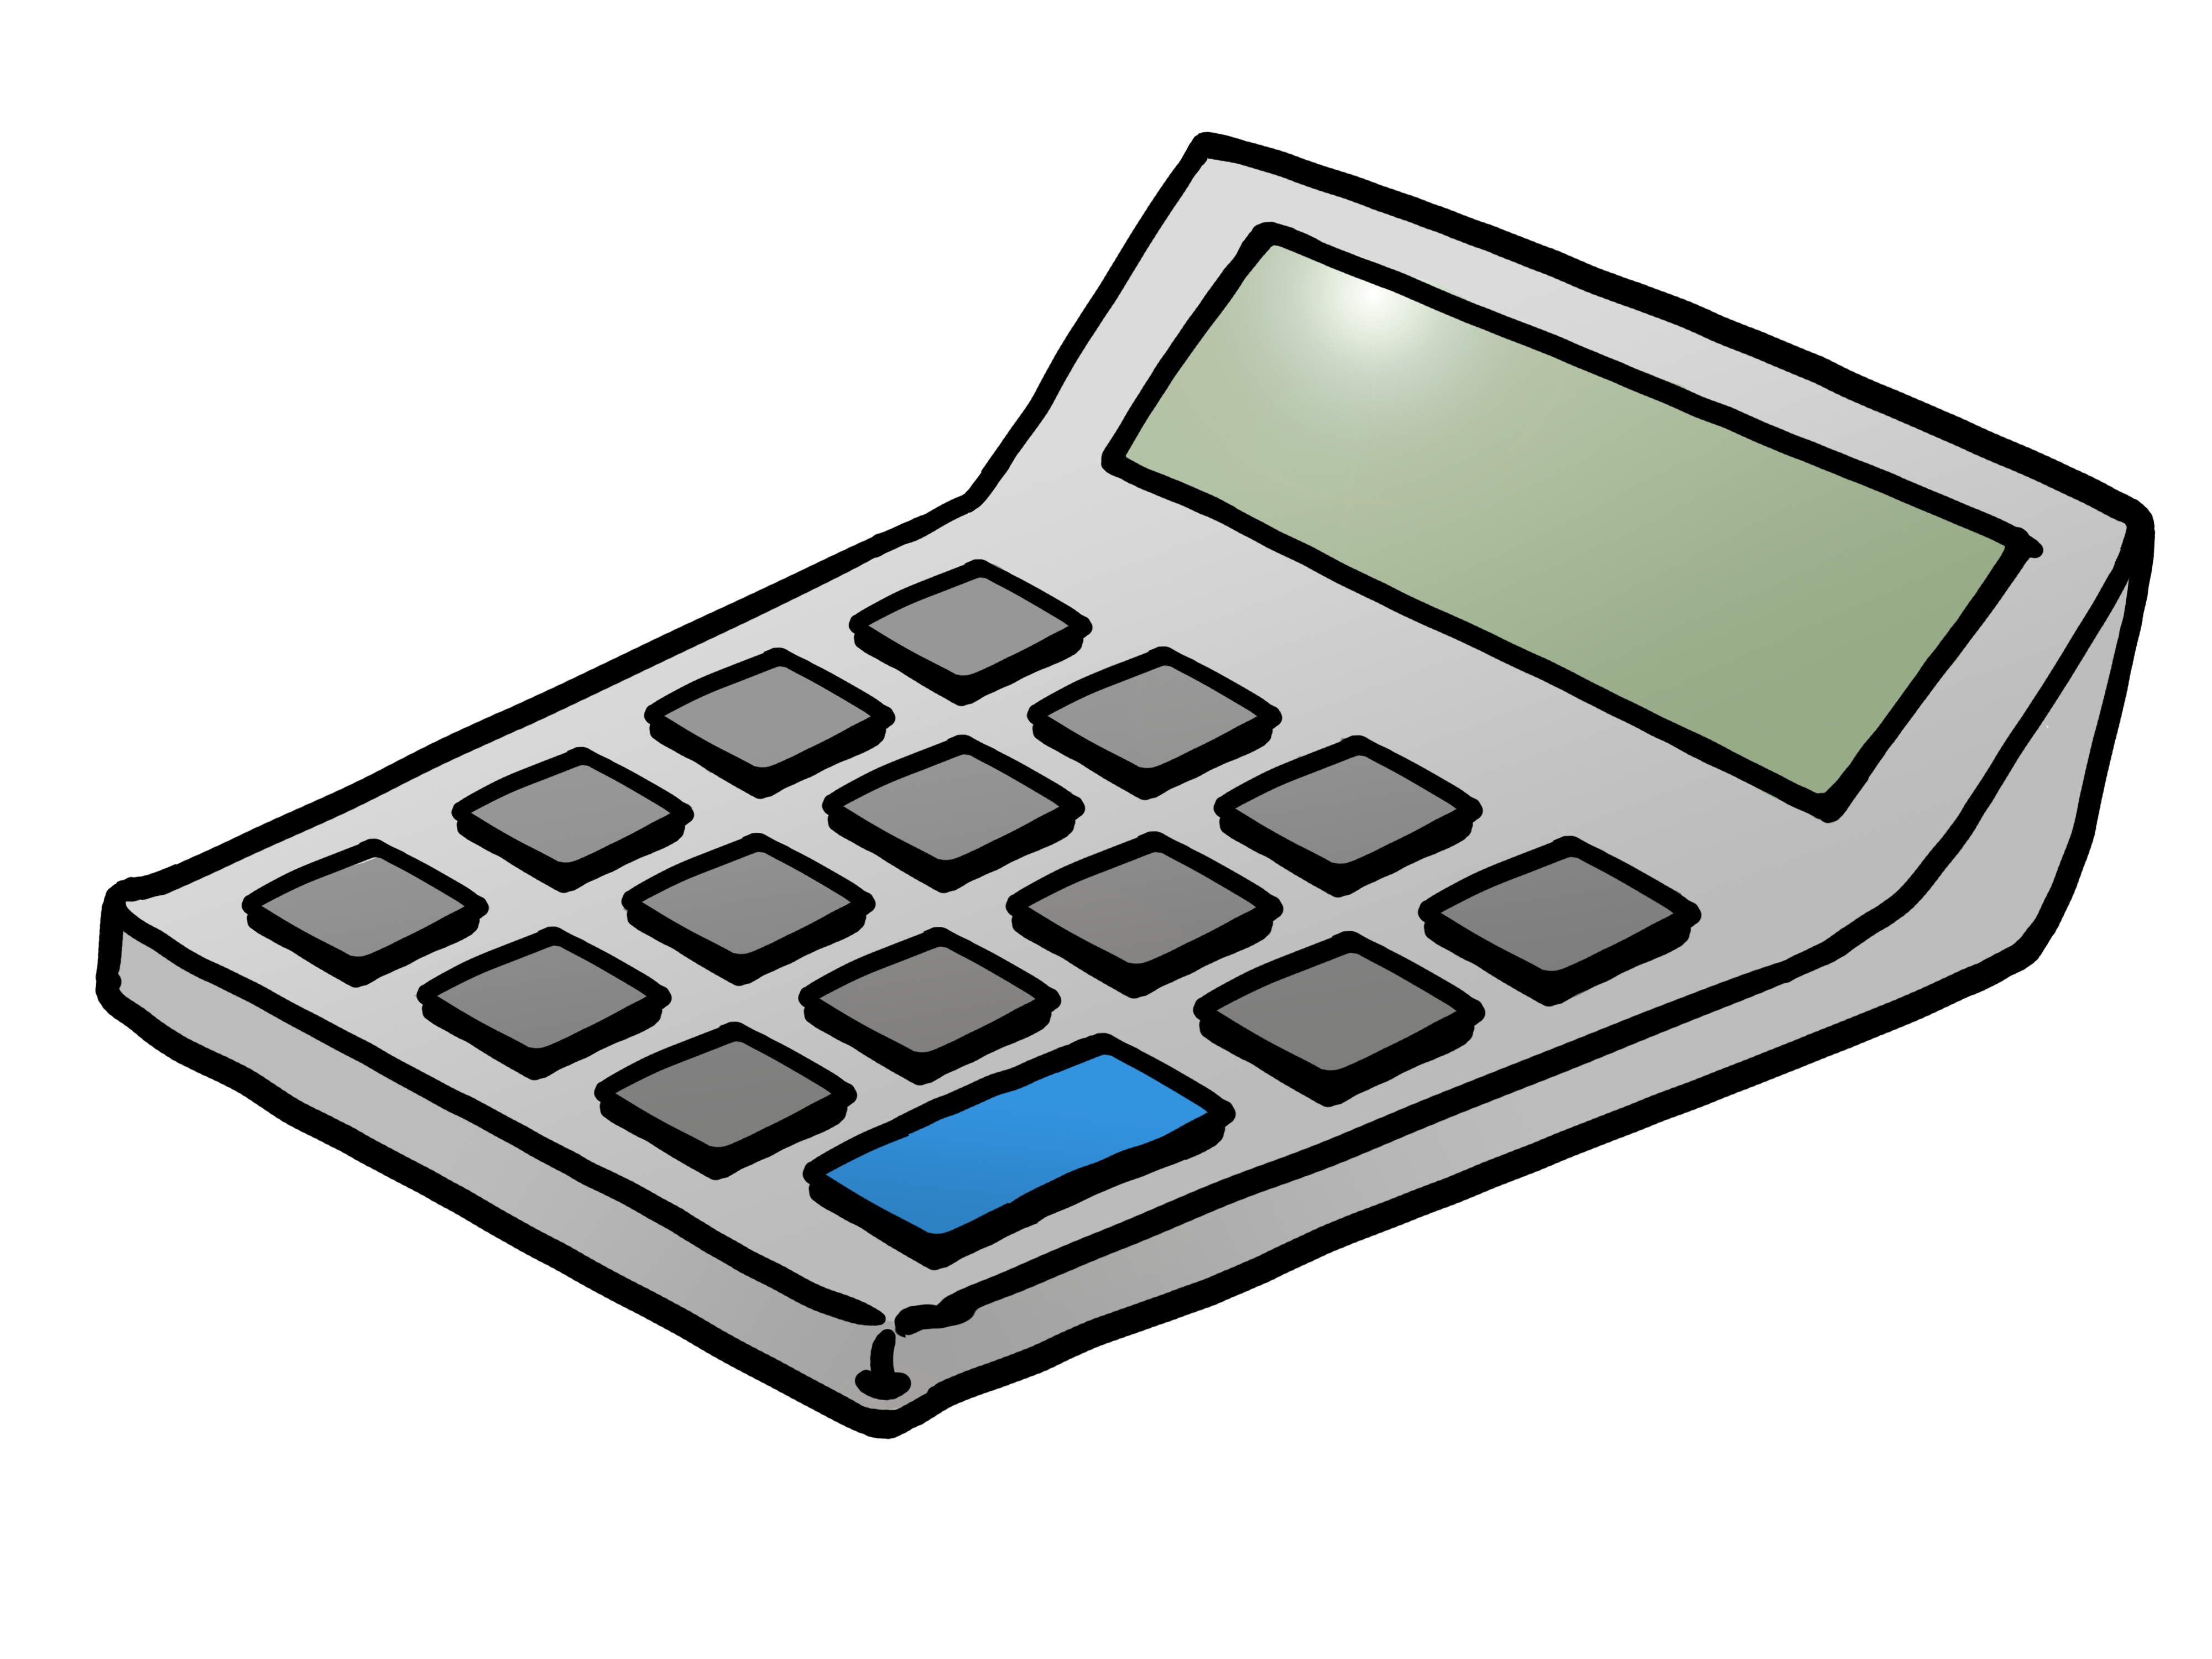 Calculator Clipart-calculator clipart-2